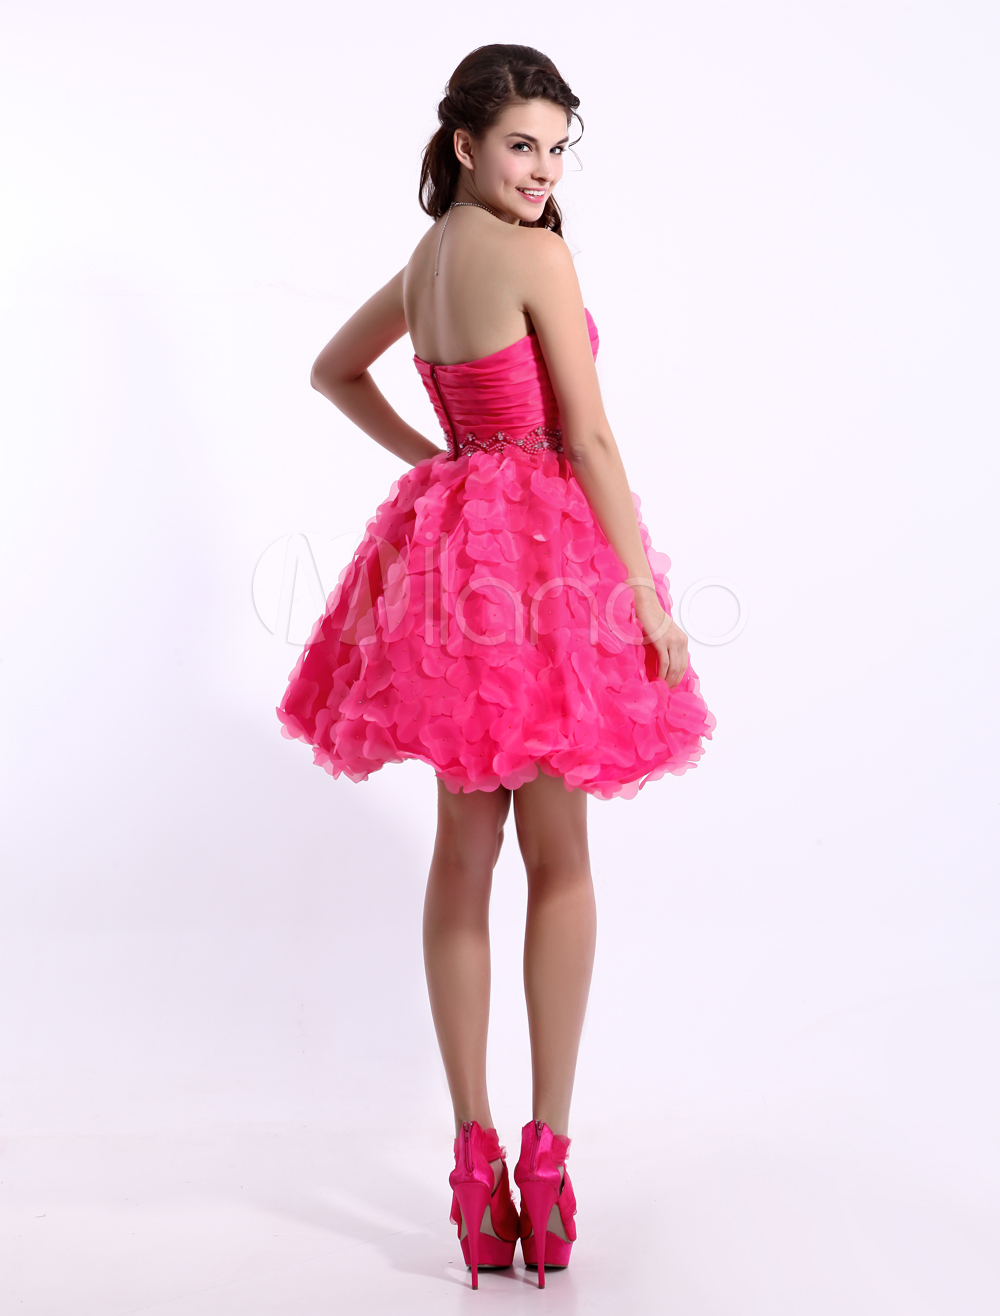 bba0bbd487c Hot Pink Cocktail Dress Organza 3D Flowers Beaded Prom Dress Strapless  Sleeveless A Line Short Party Dress Milanoo  Organza